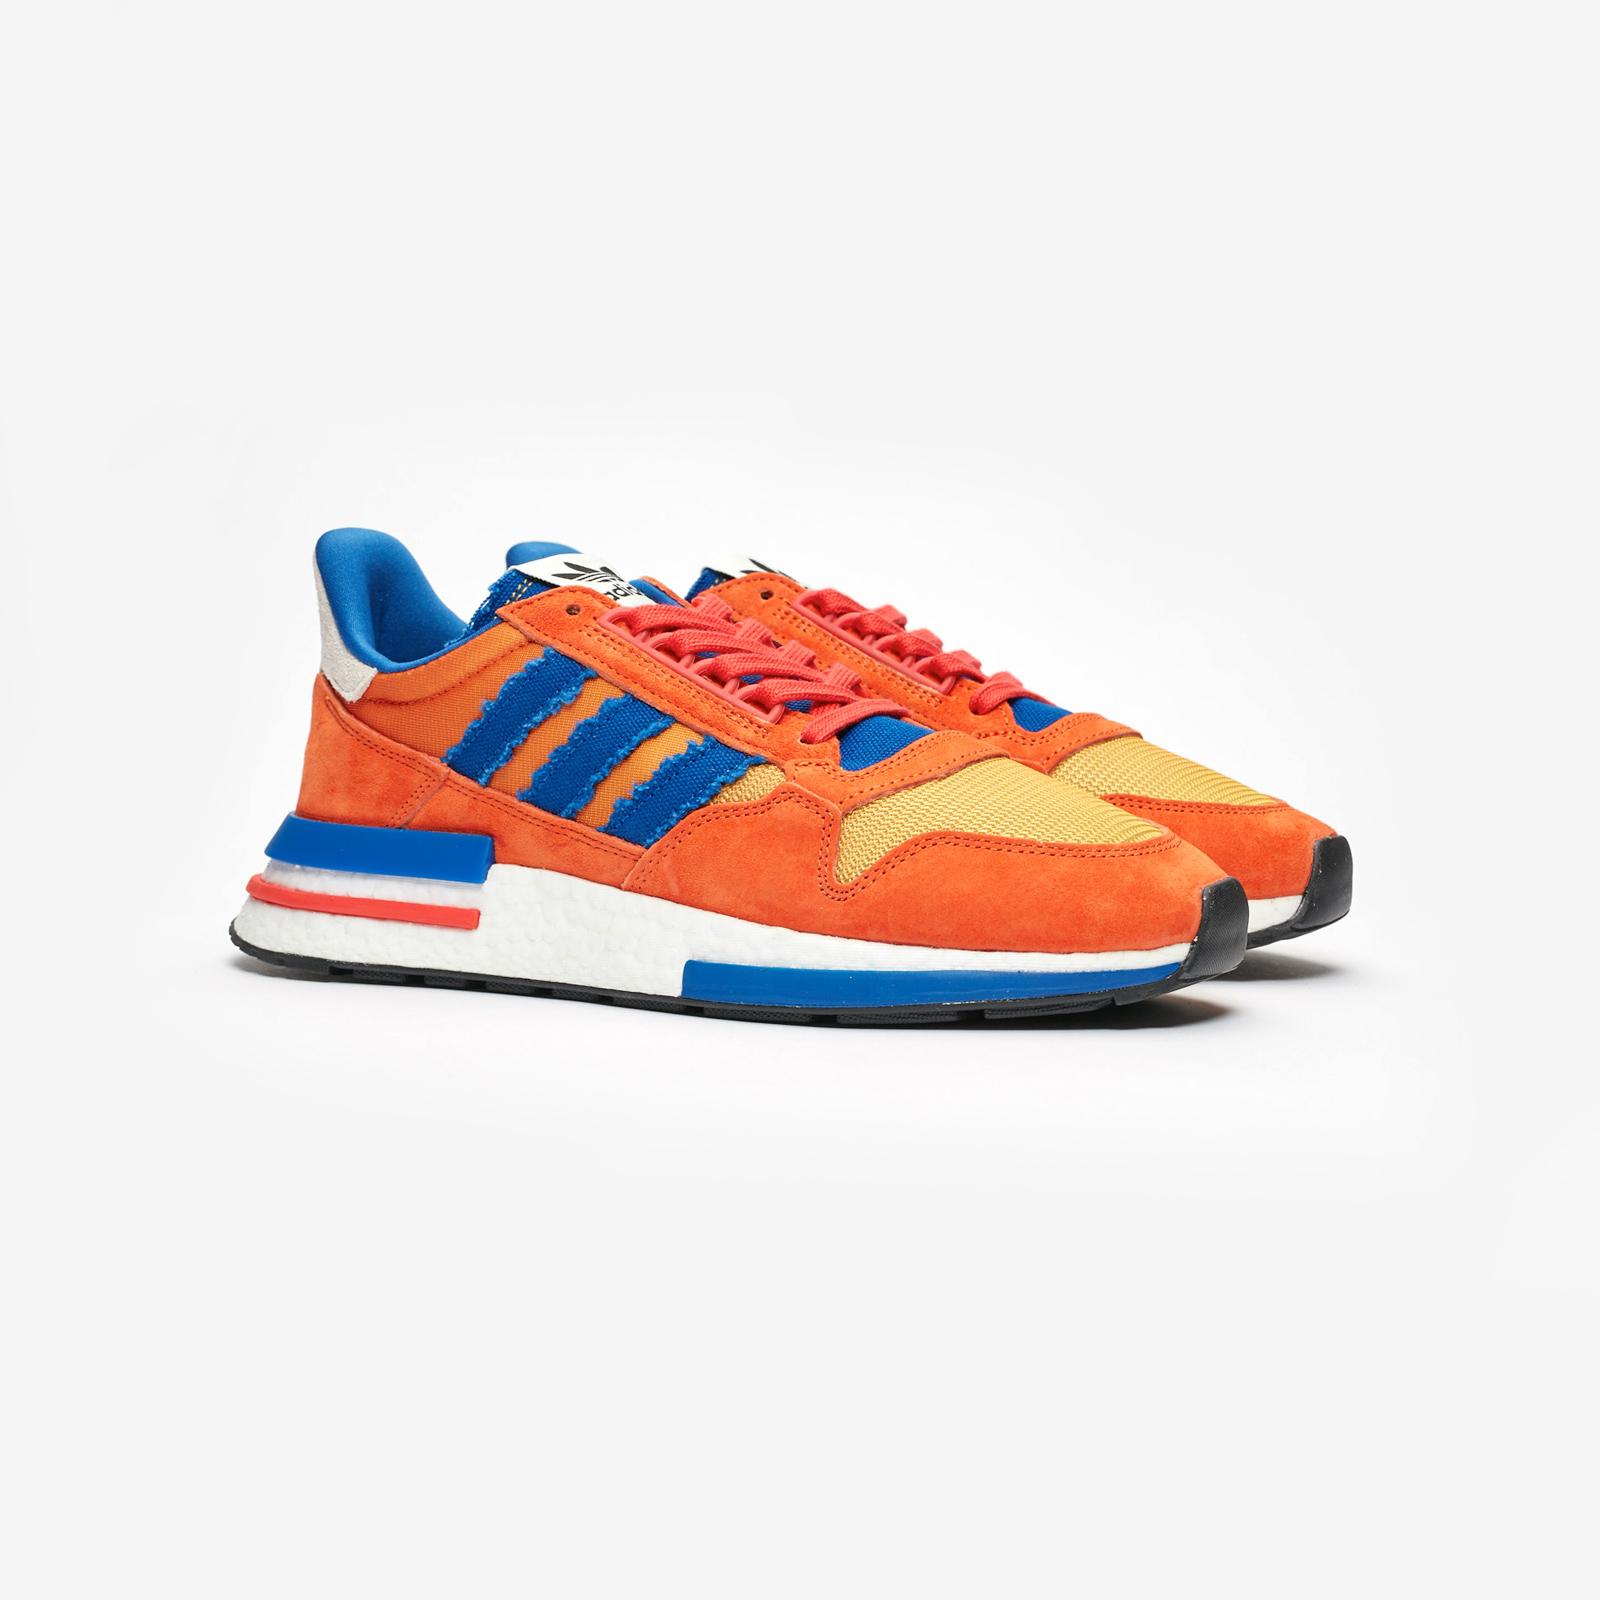 virtual Contador frontera  adidas ZX 500 RM x Dragon Ball Z - D97046 - Sneakersnstuff | sneakers &  streetwear online since 1999